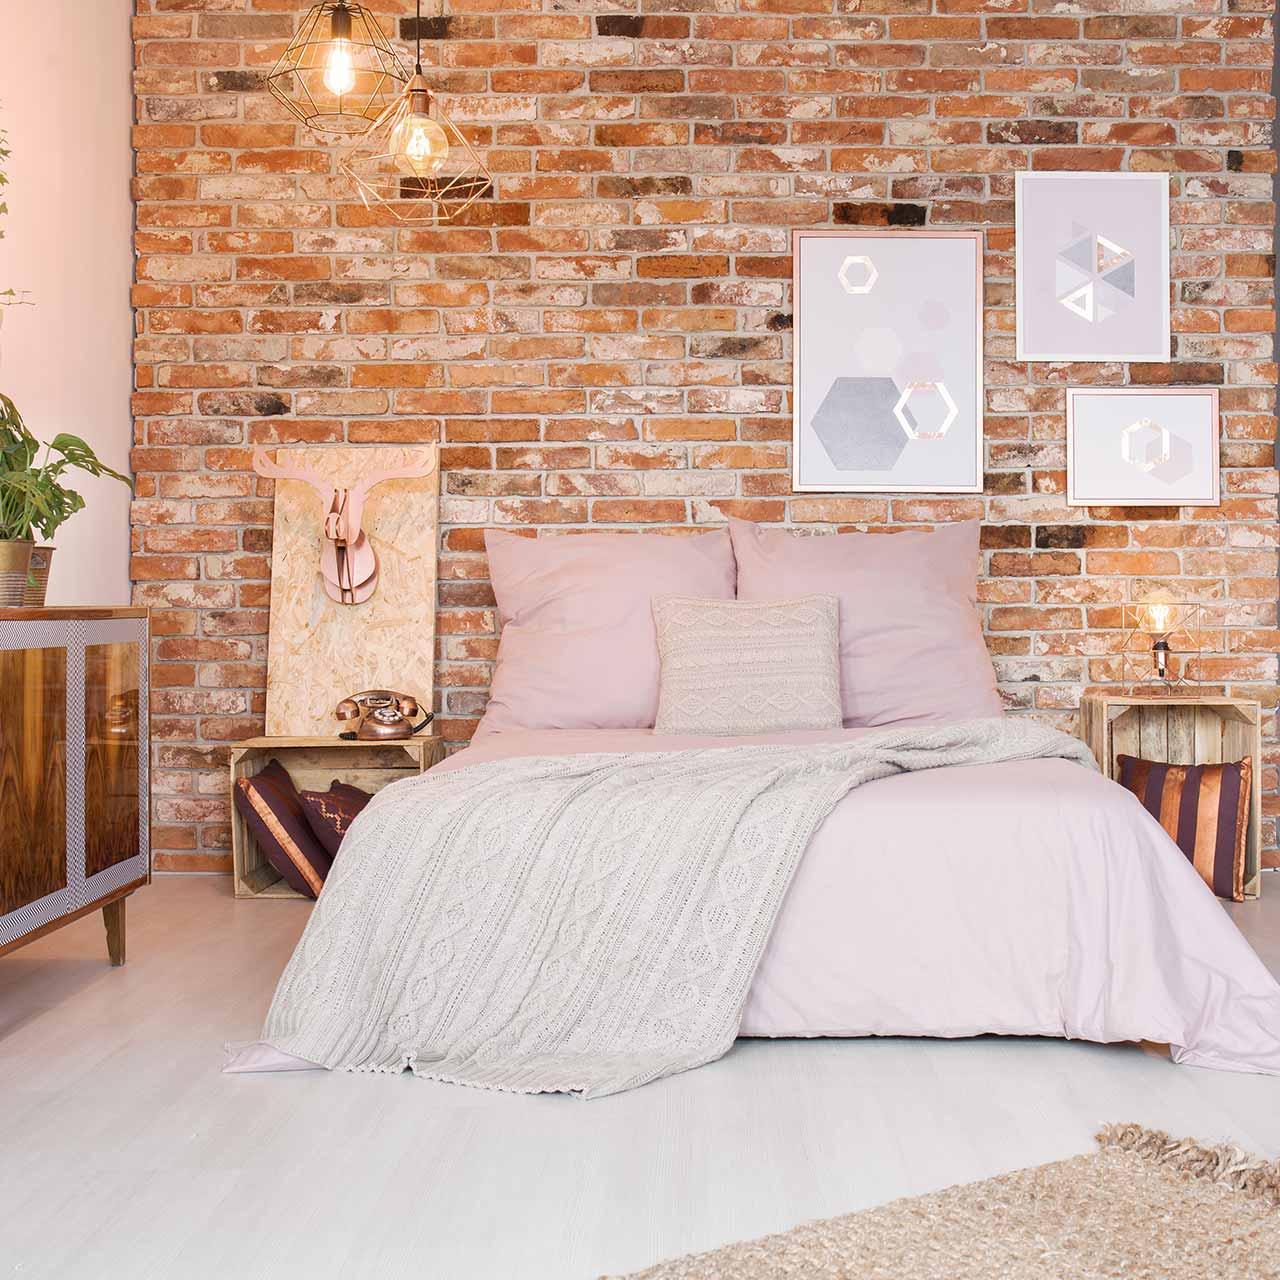 illuminating lightining idea for industrial style bedroom design